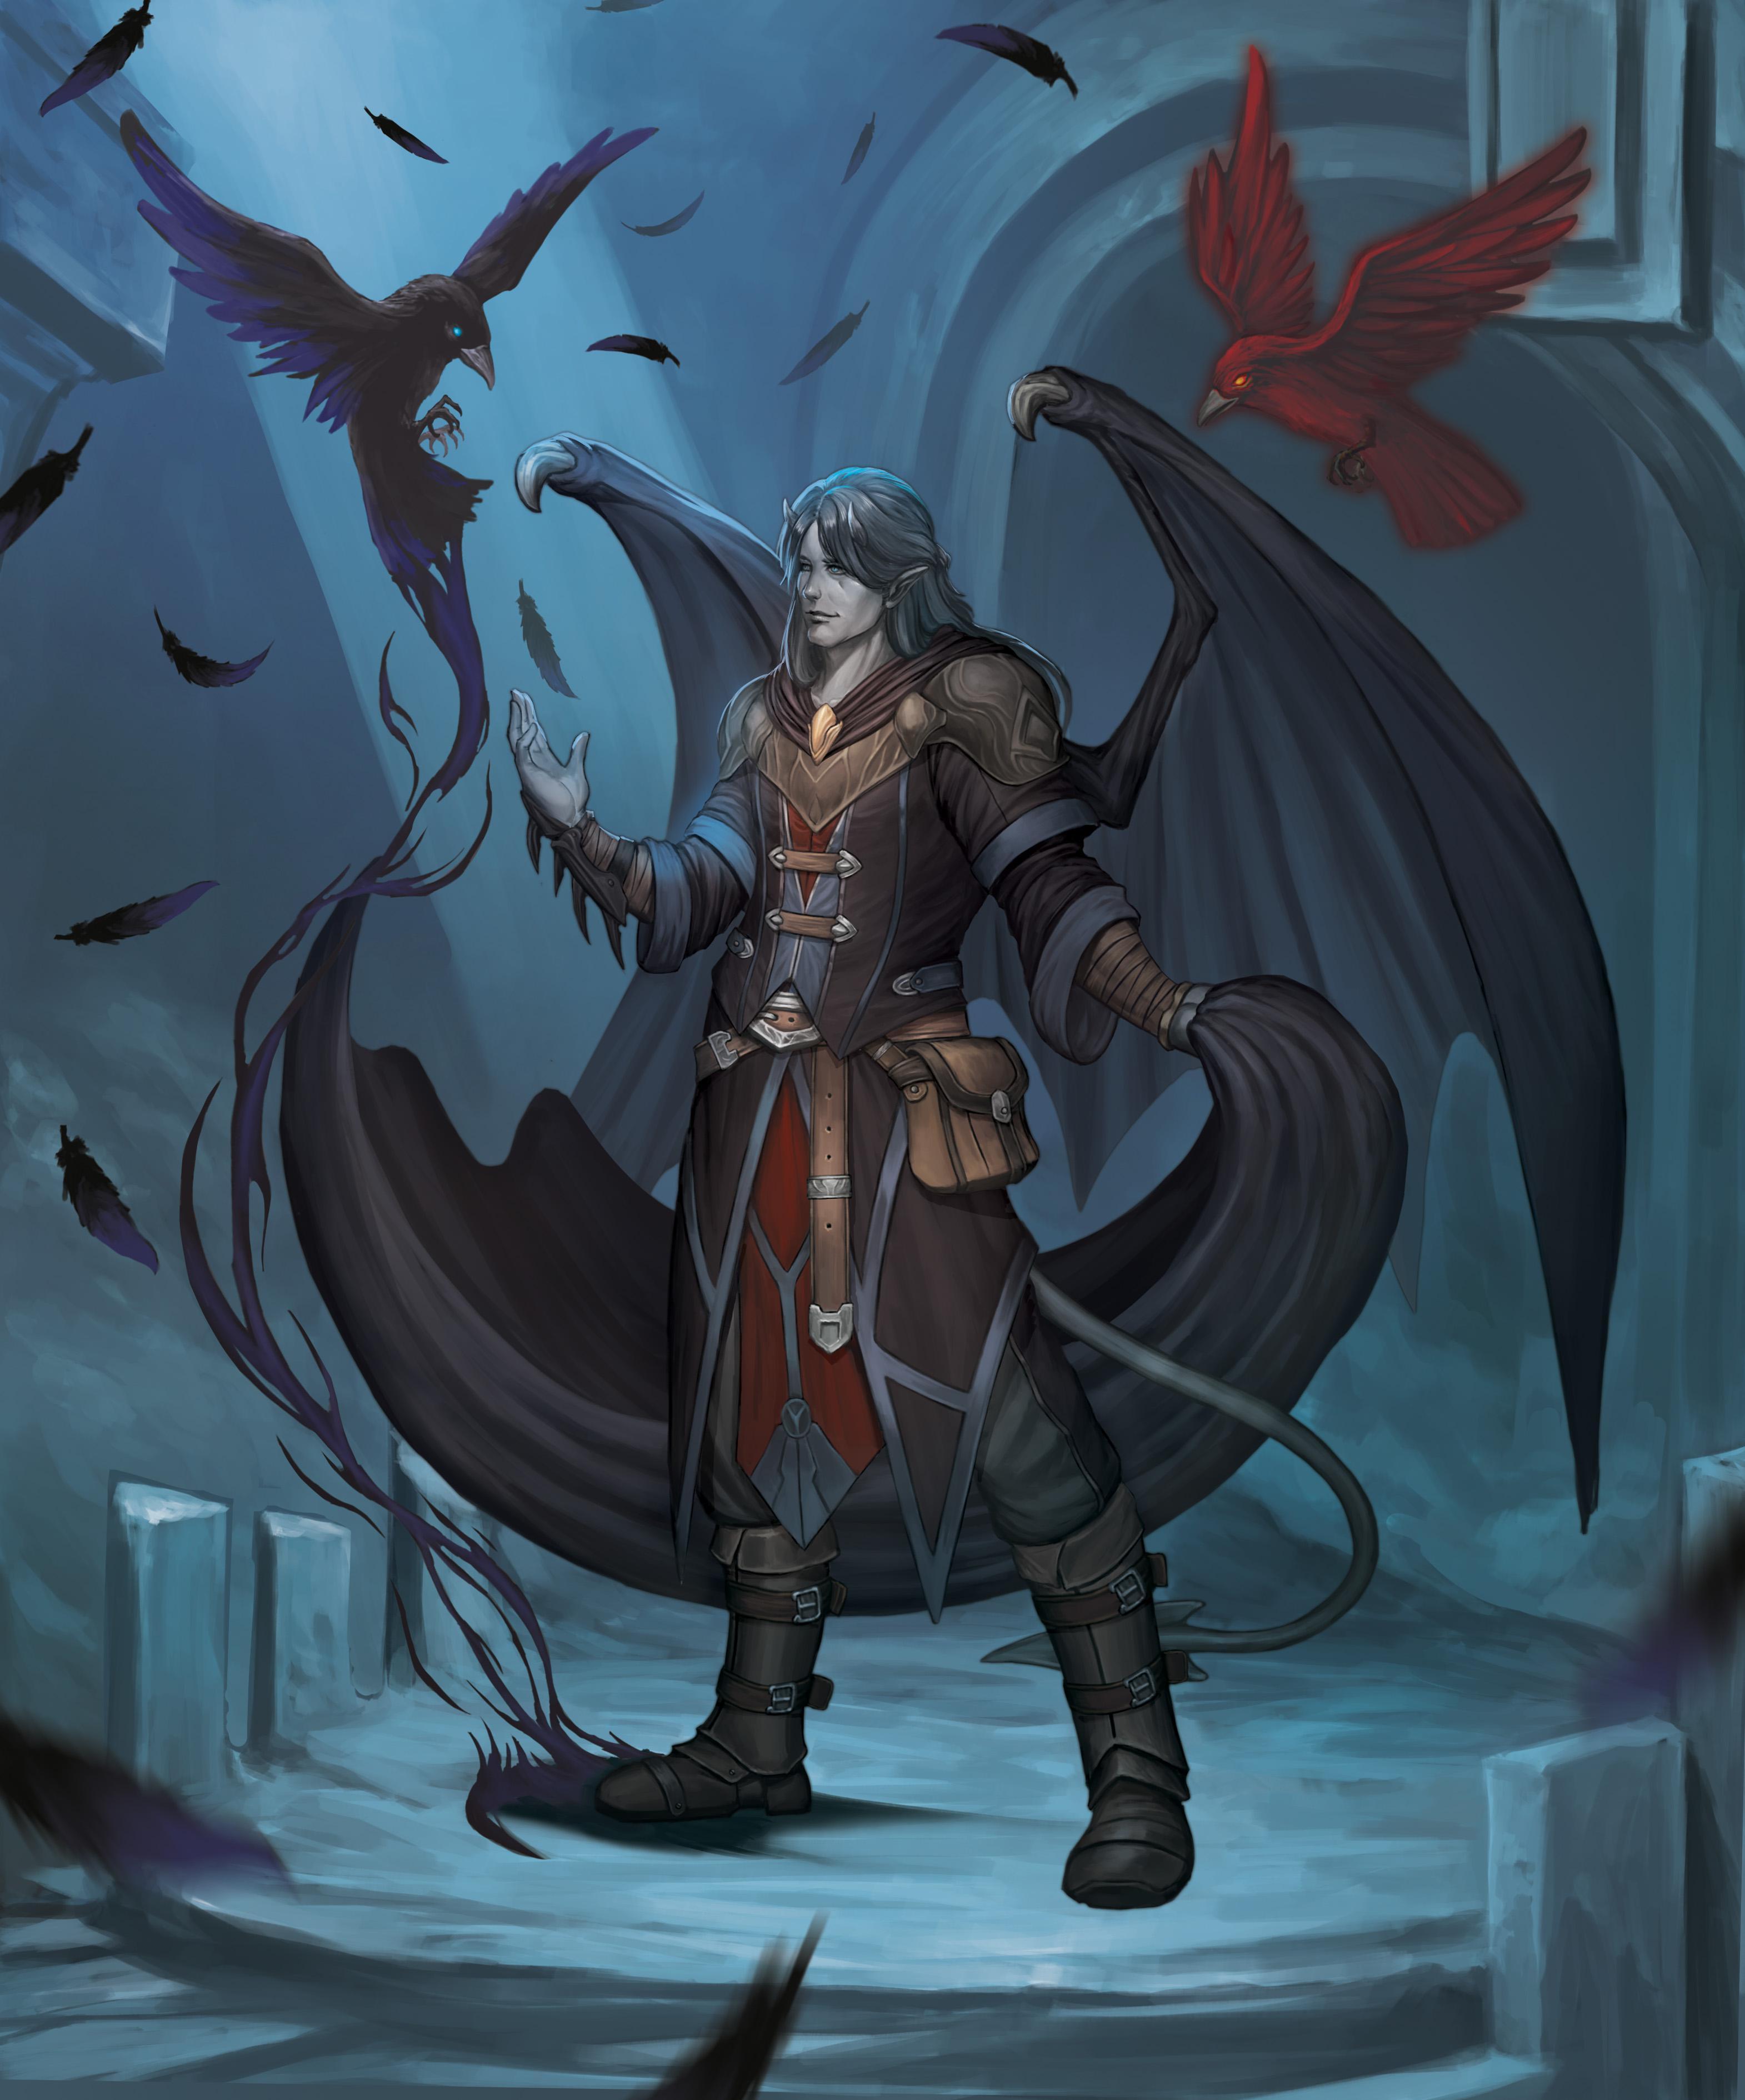 The Raven Queen : raven, queen, Draven,, Raven, Queen, Warlock, Tiefling, Birds,, Merula, Nevermore., Artist, Comments.